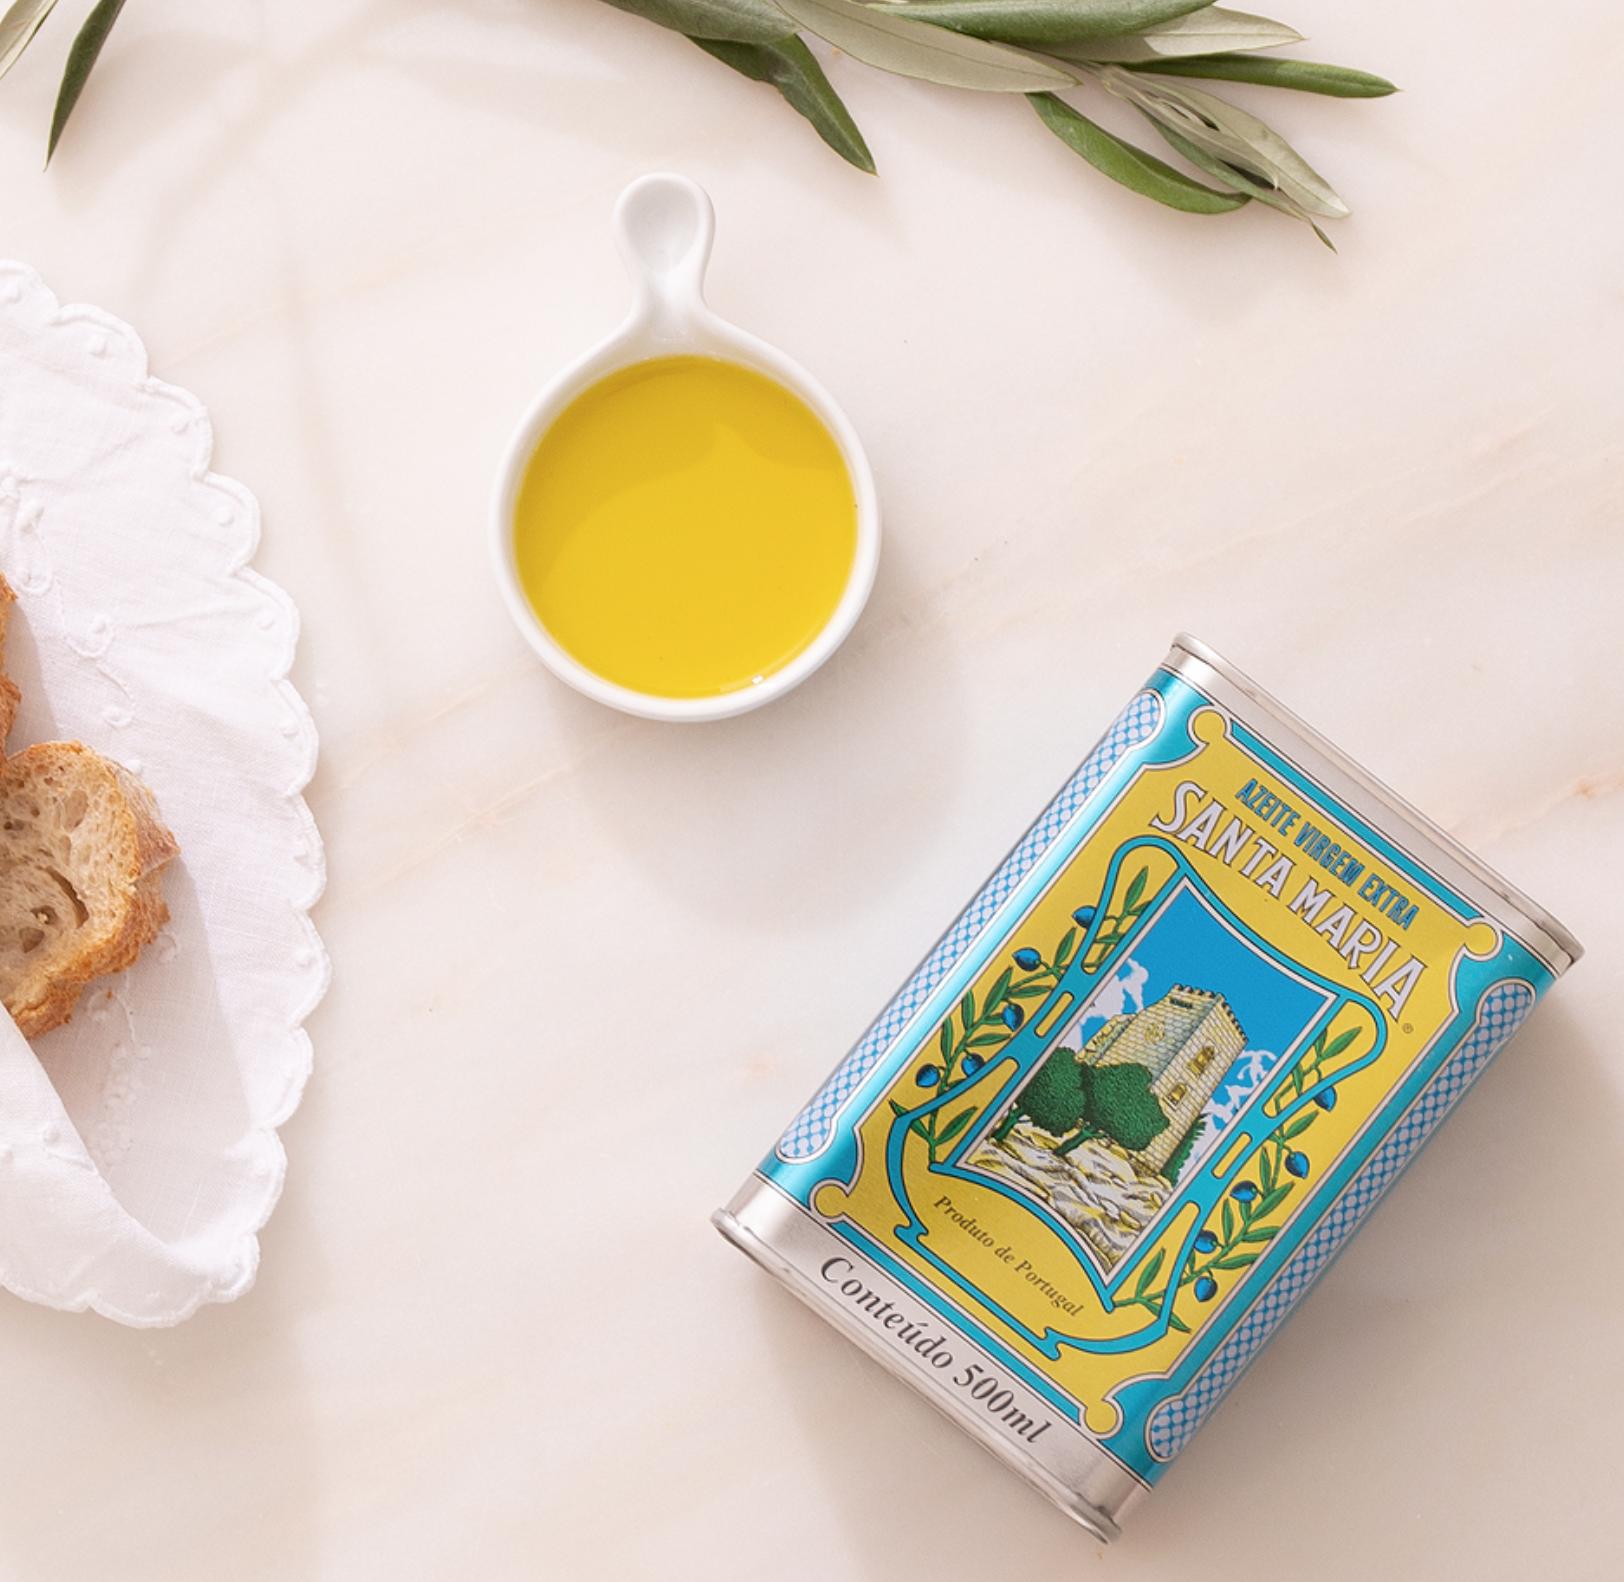 Extra Virgin Olive Oil Santa Maria